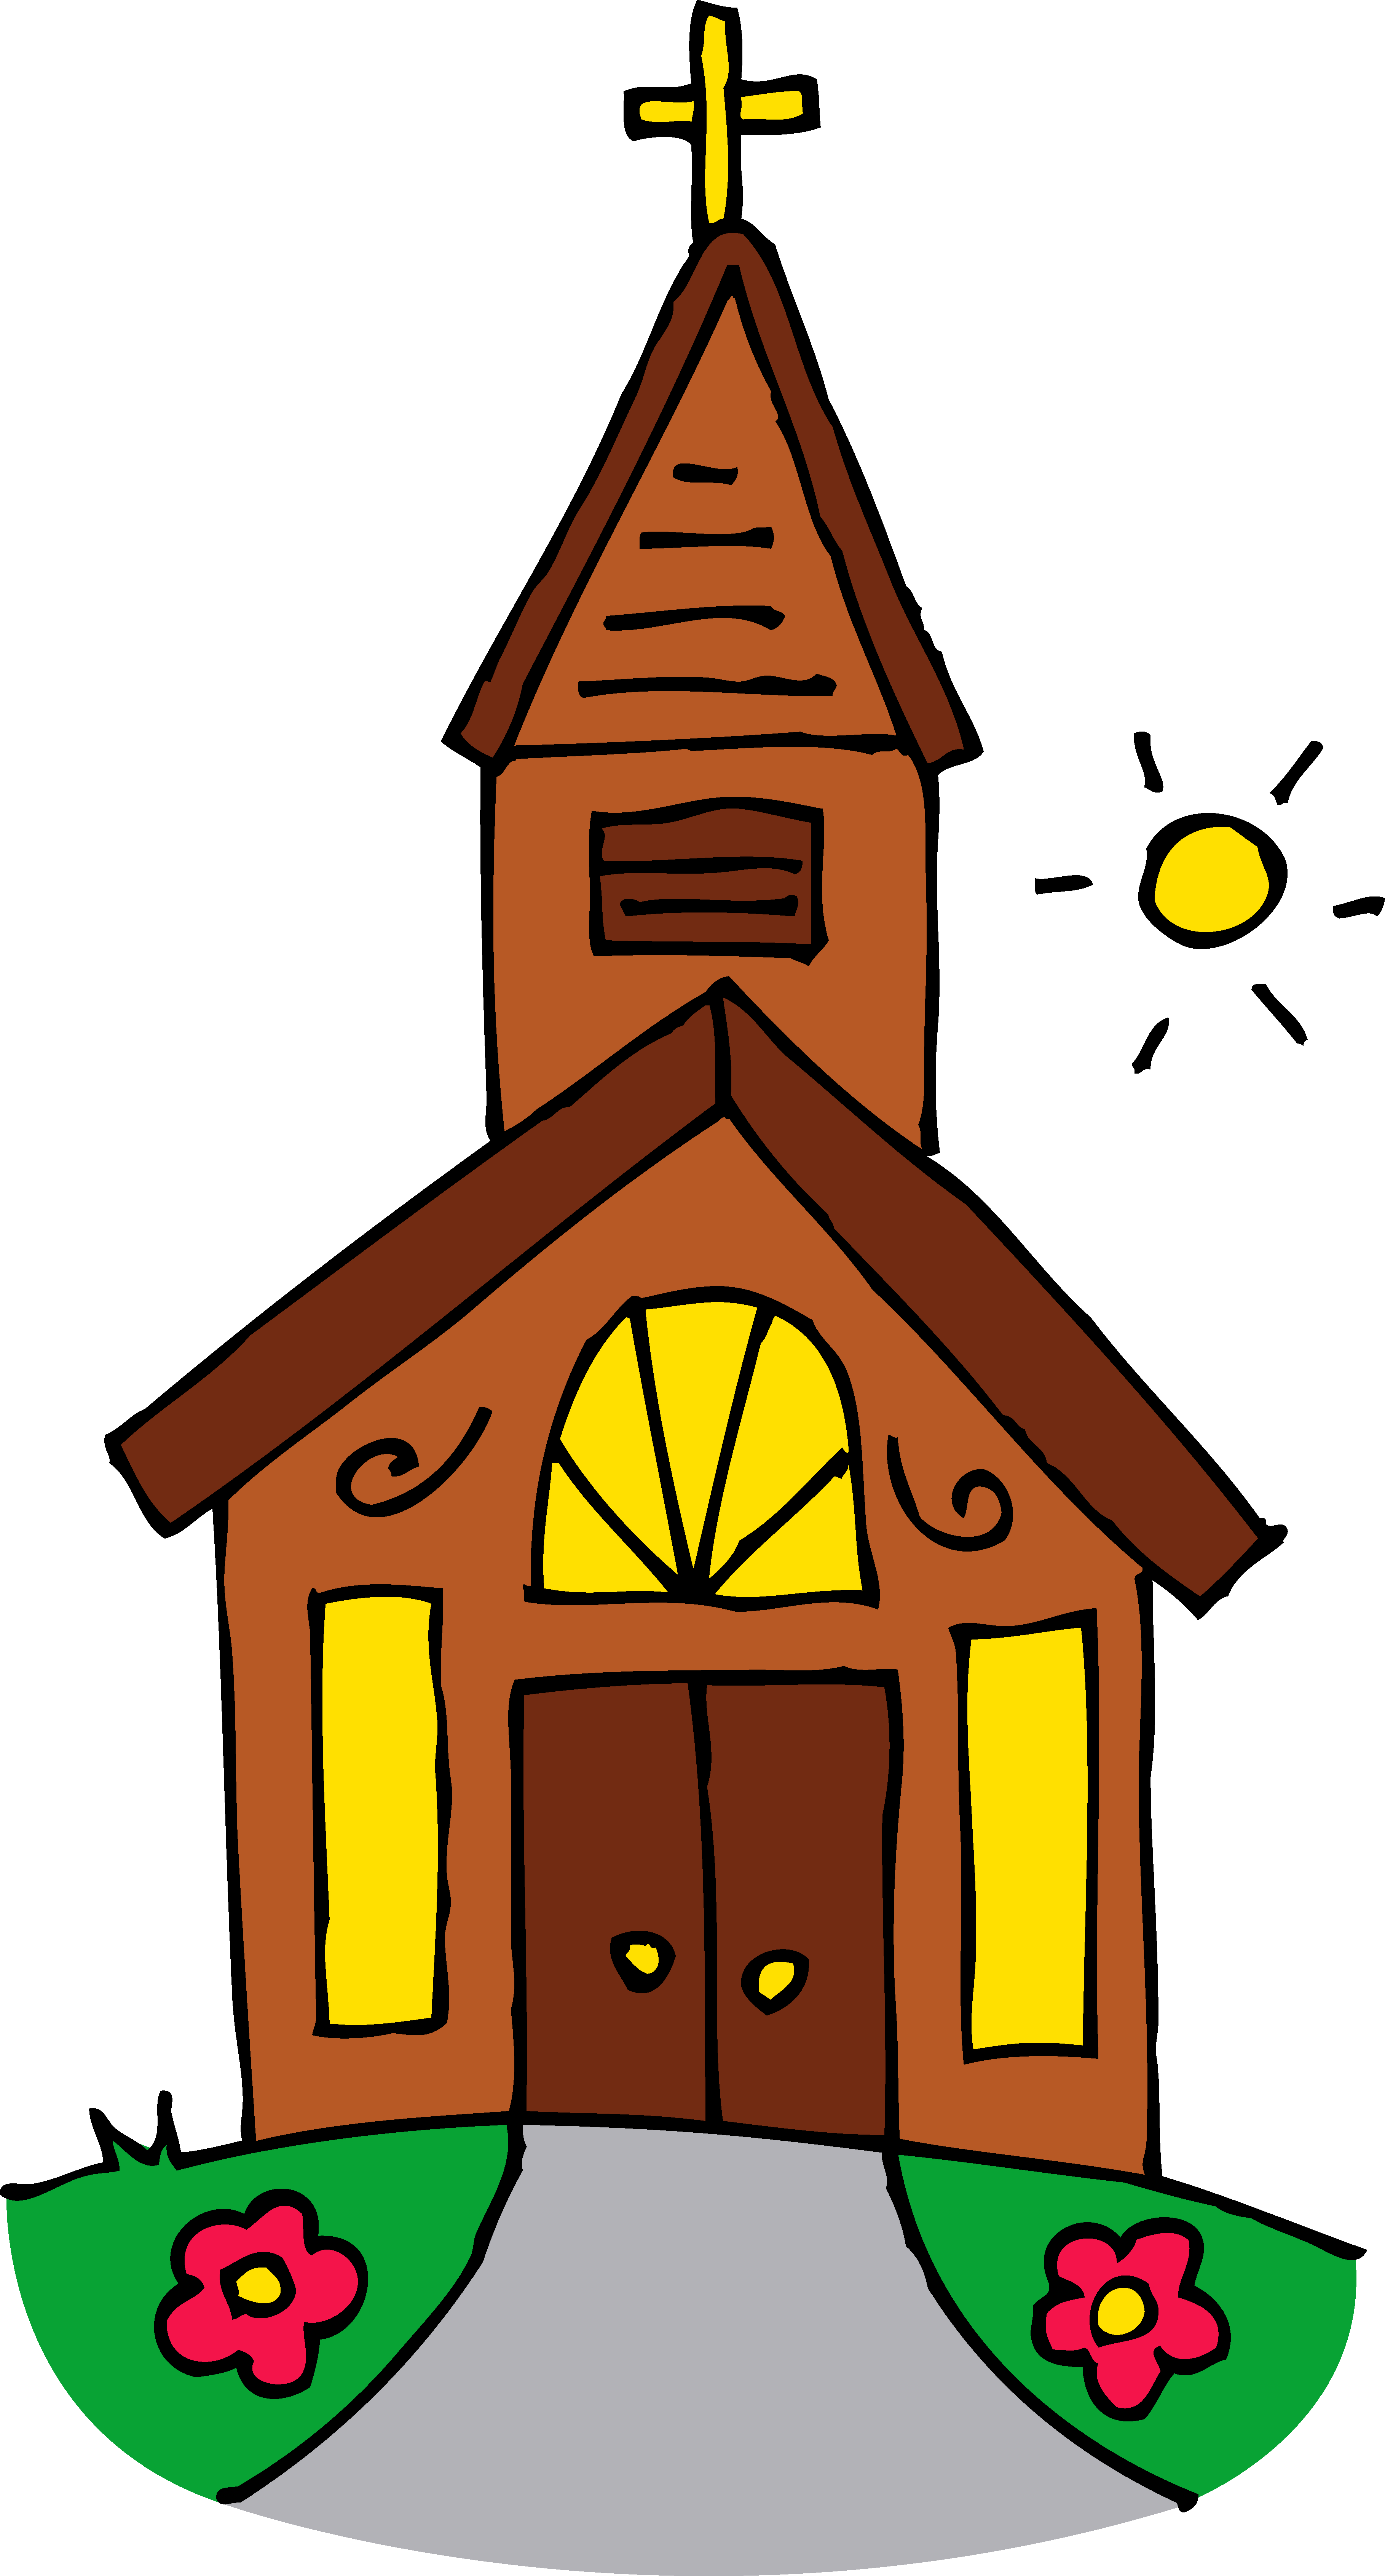 Church Clip Art - Blogsbeta